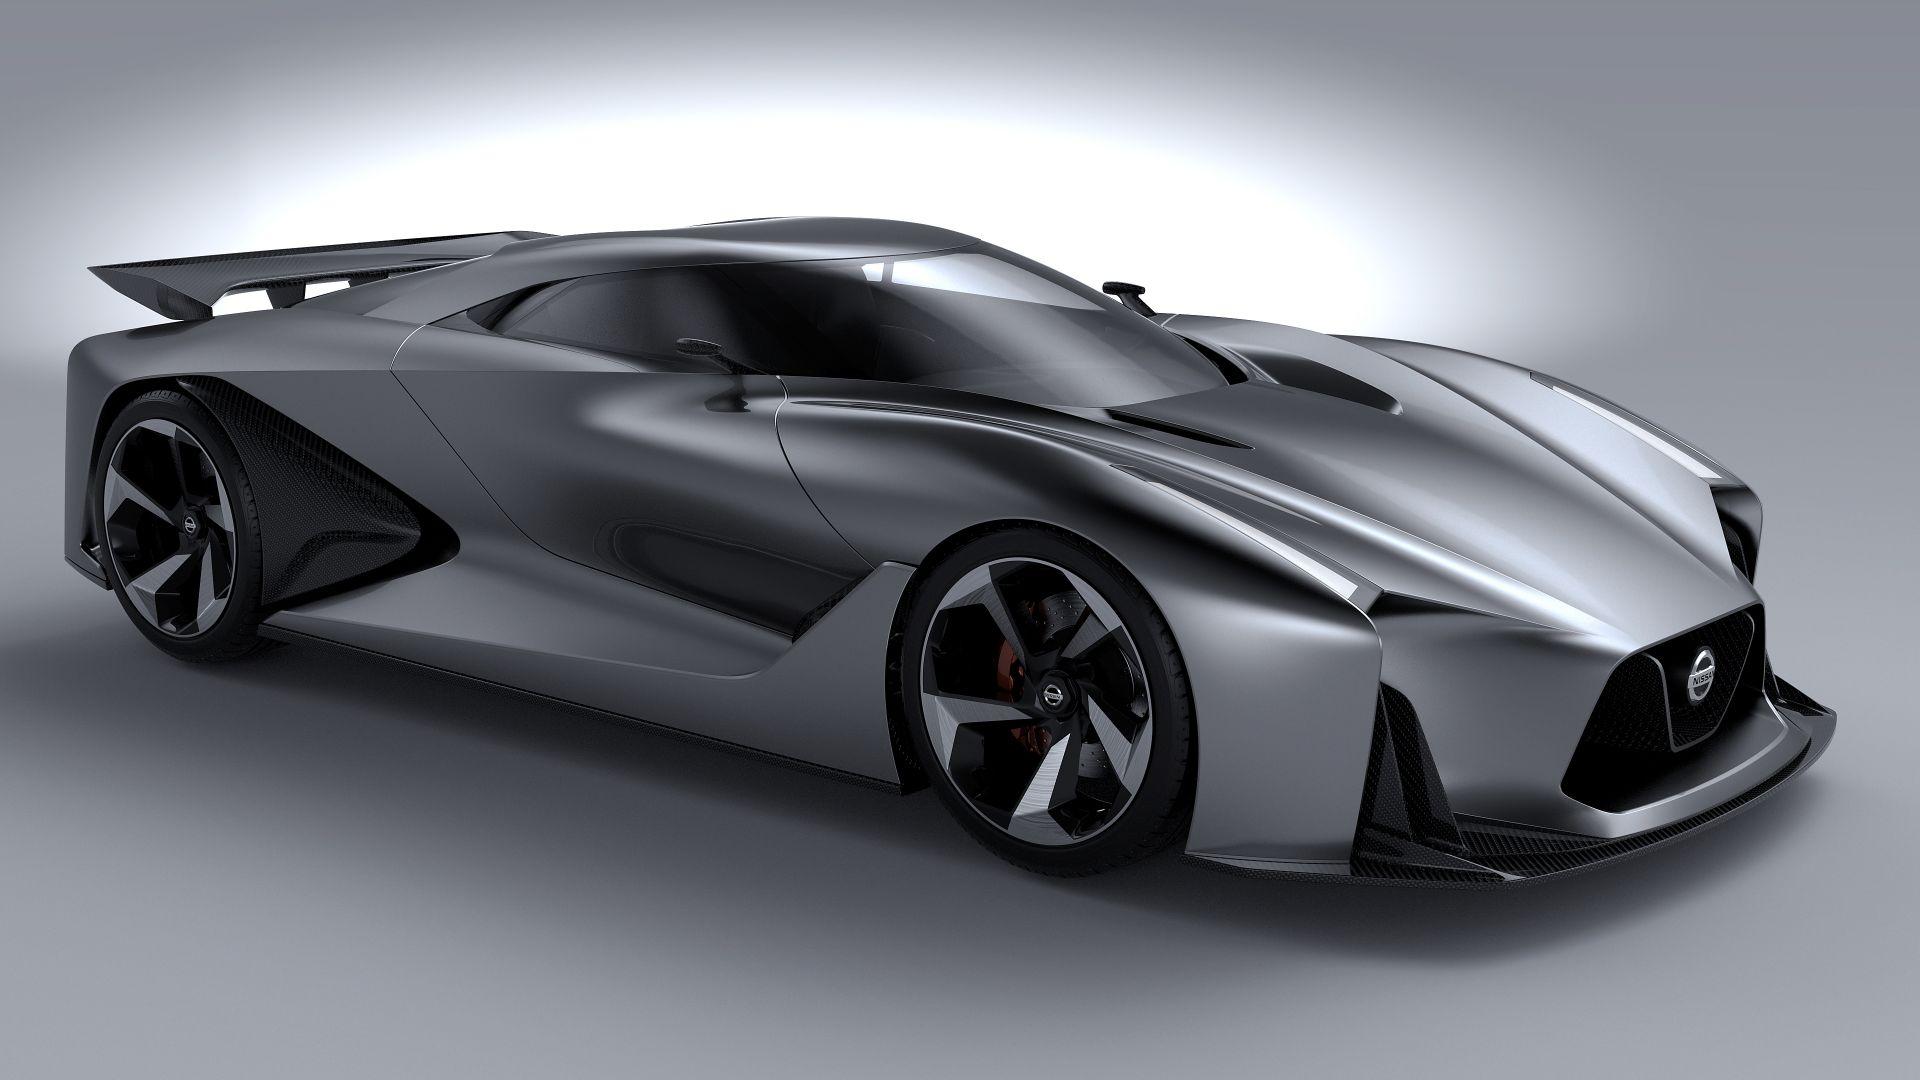 wallpaper nissan 2020 vision gran turismo  concept  nissan  supercar  luxury cars  sports car